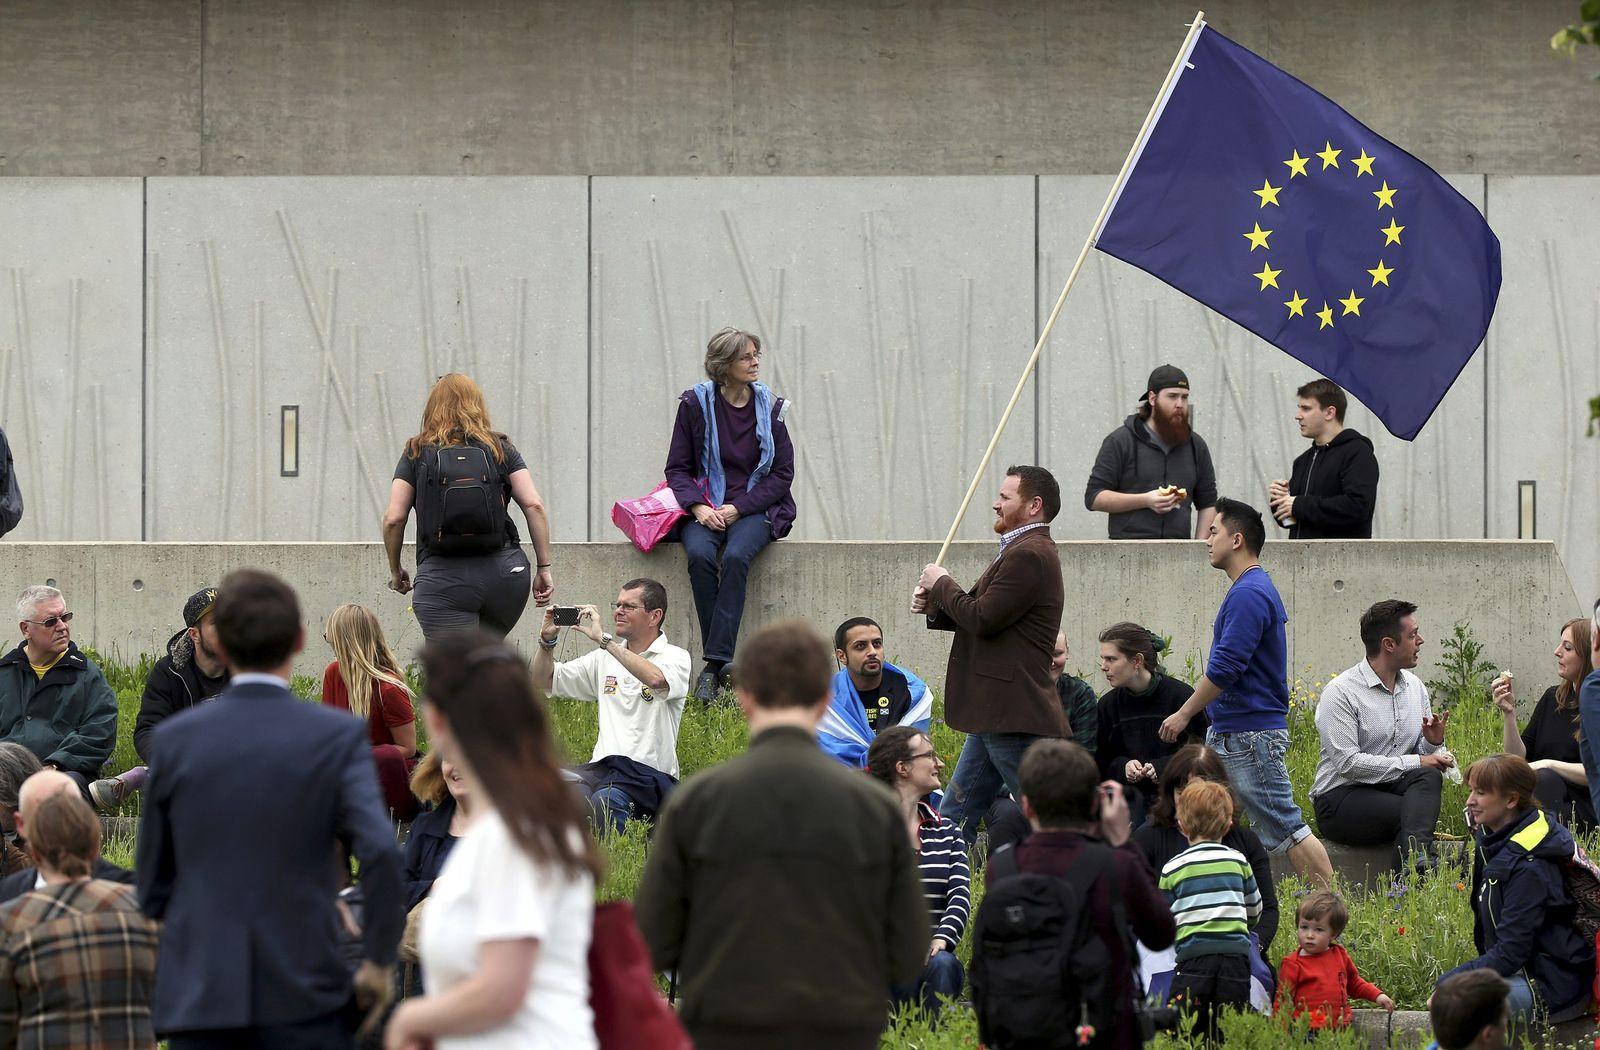 schottland fahne EU